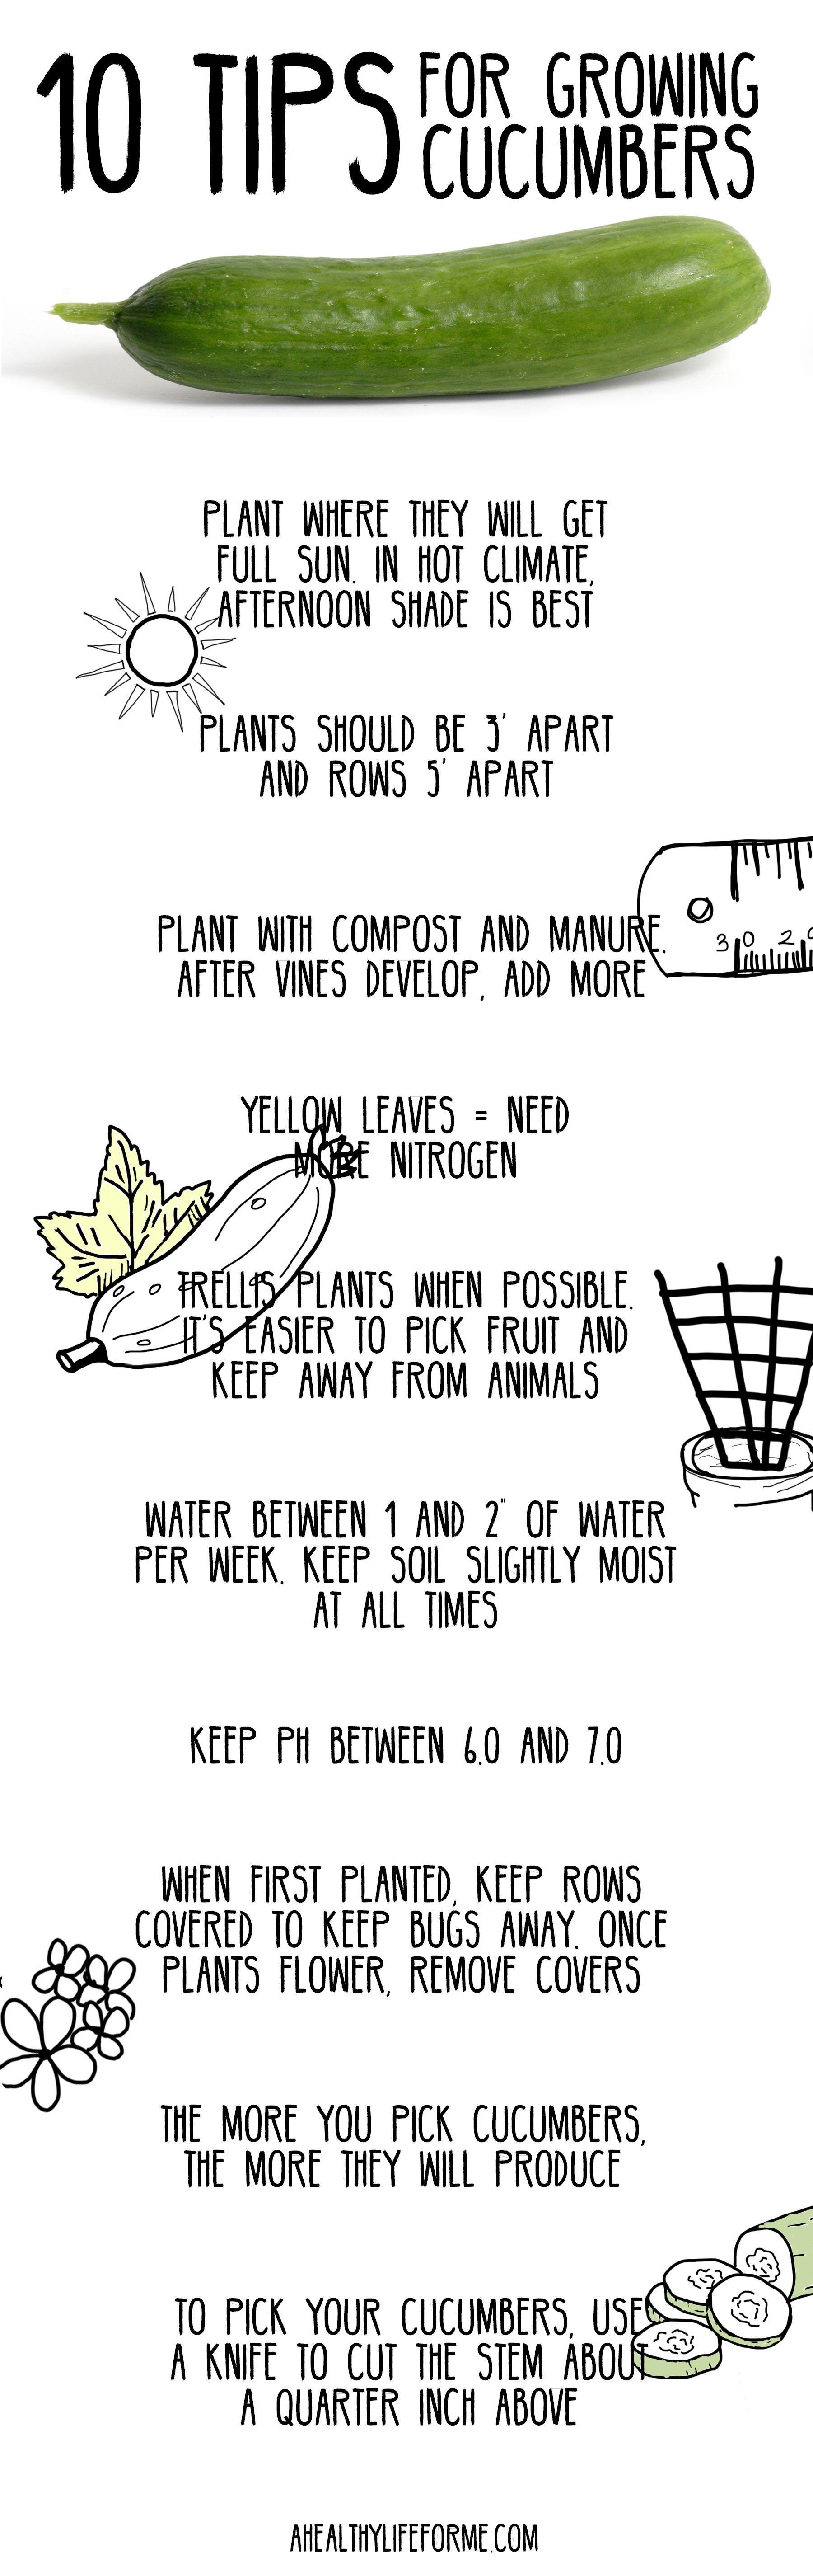 5e6342d88761a2dc7b6ae3f2d86bb8ac - Simple Essay On My Hobby Gardening